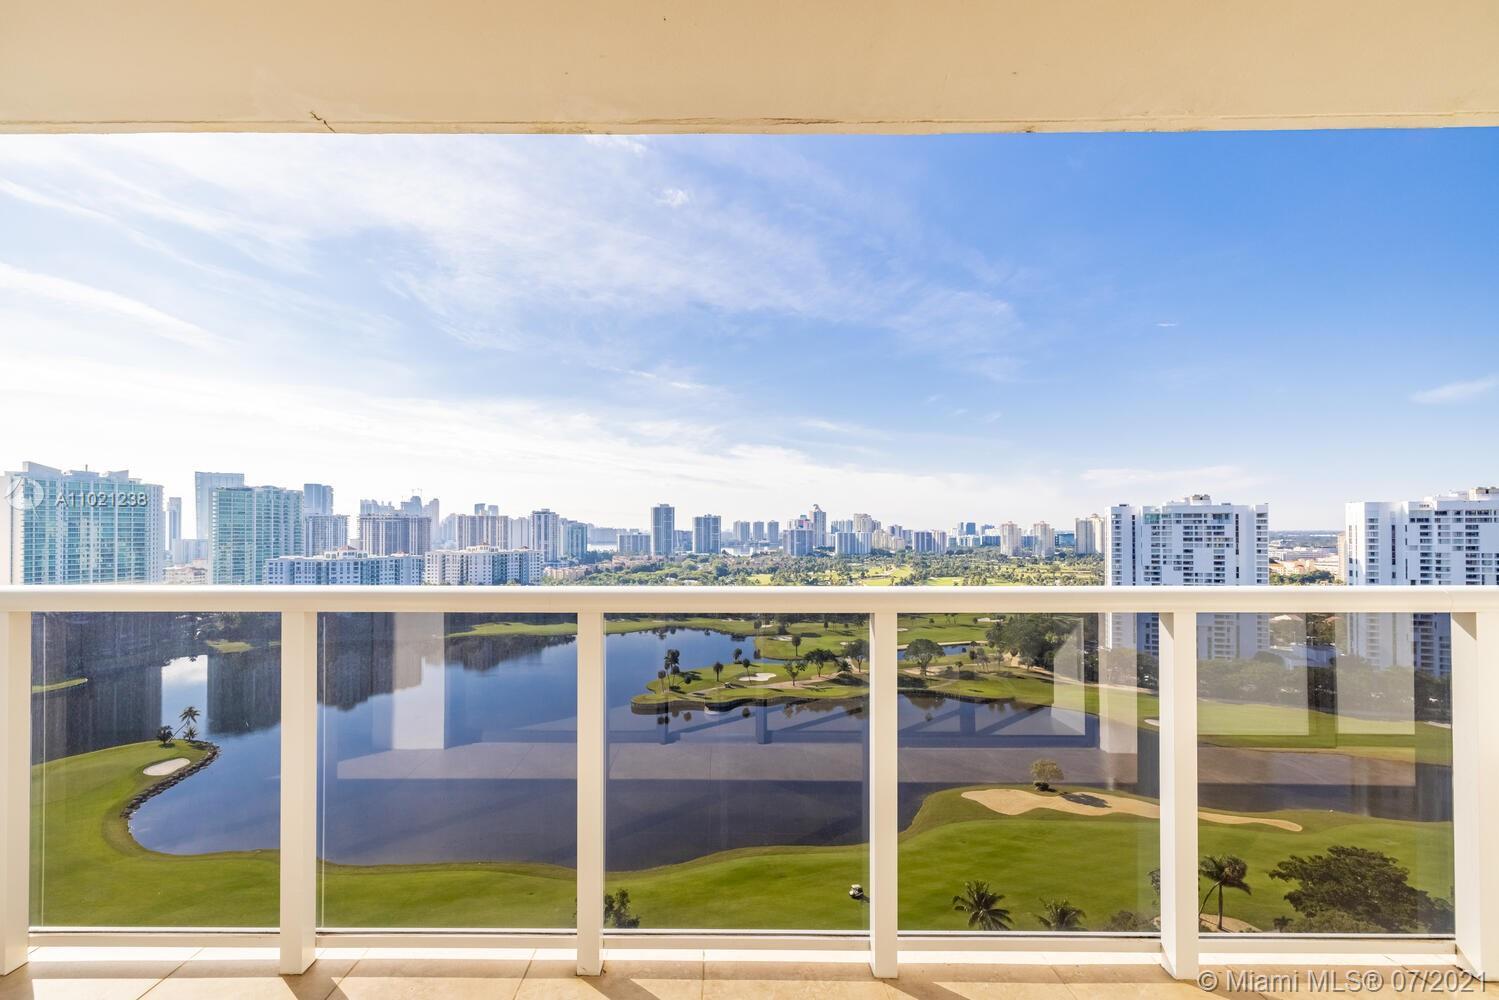 Eldorado Tower One #2506 - 3625 N Country Club Dr #2506, Aventura, FL 33180